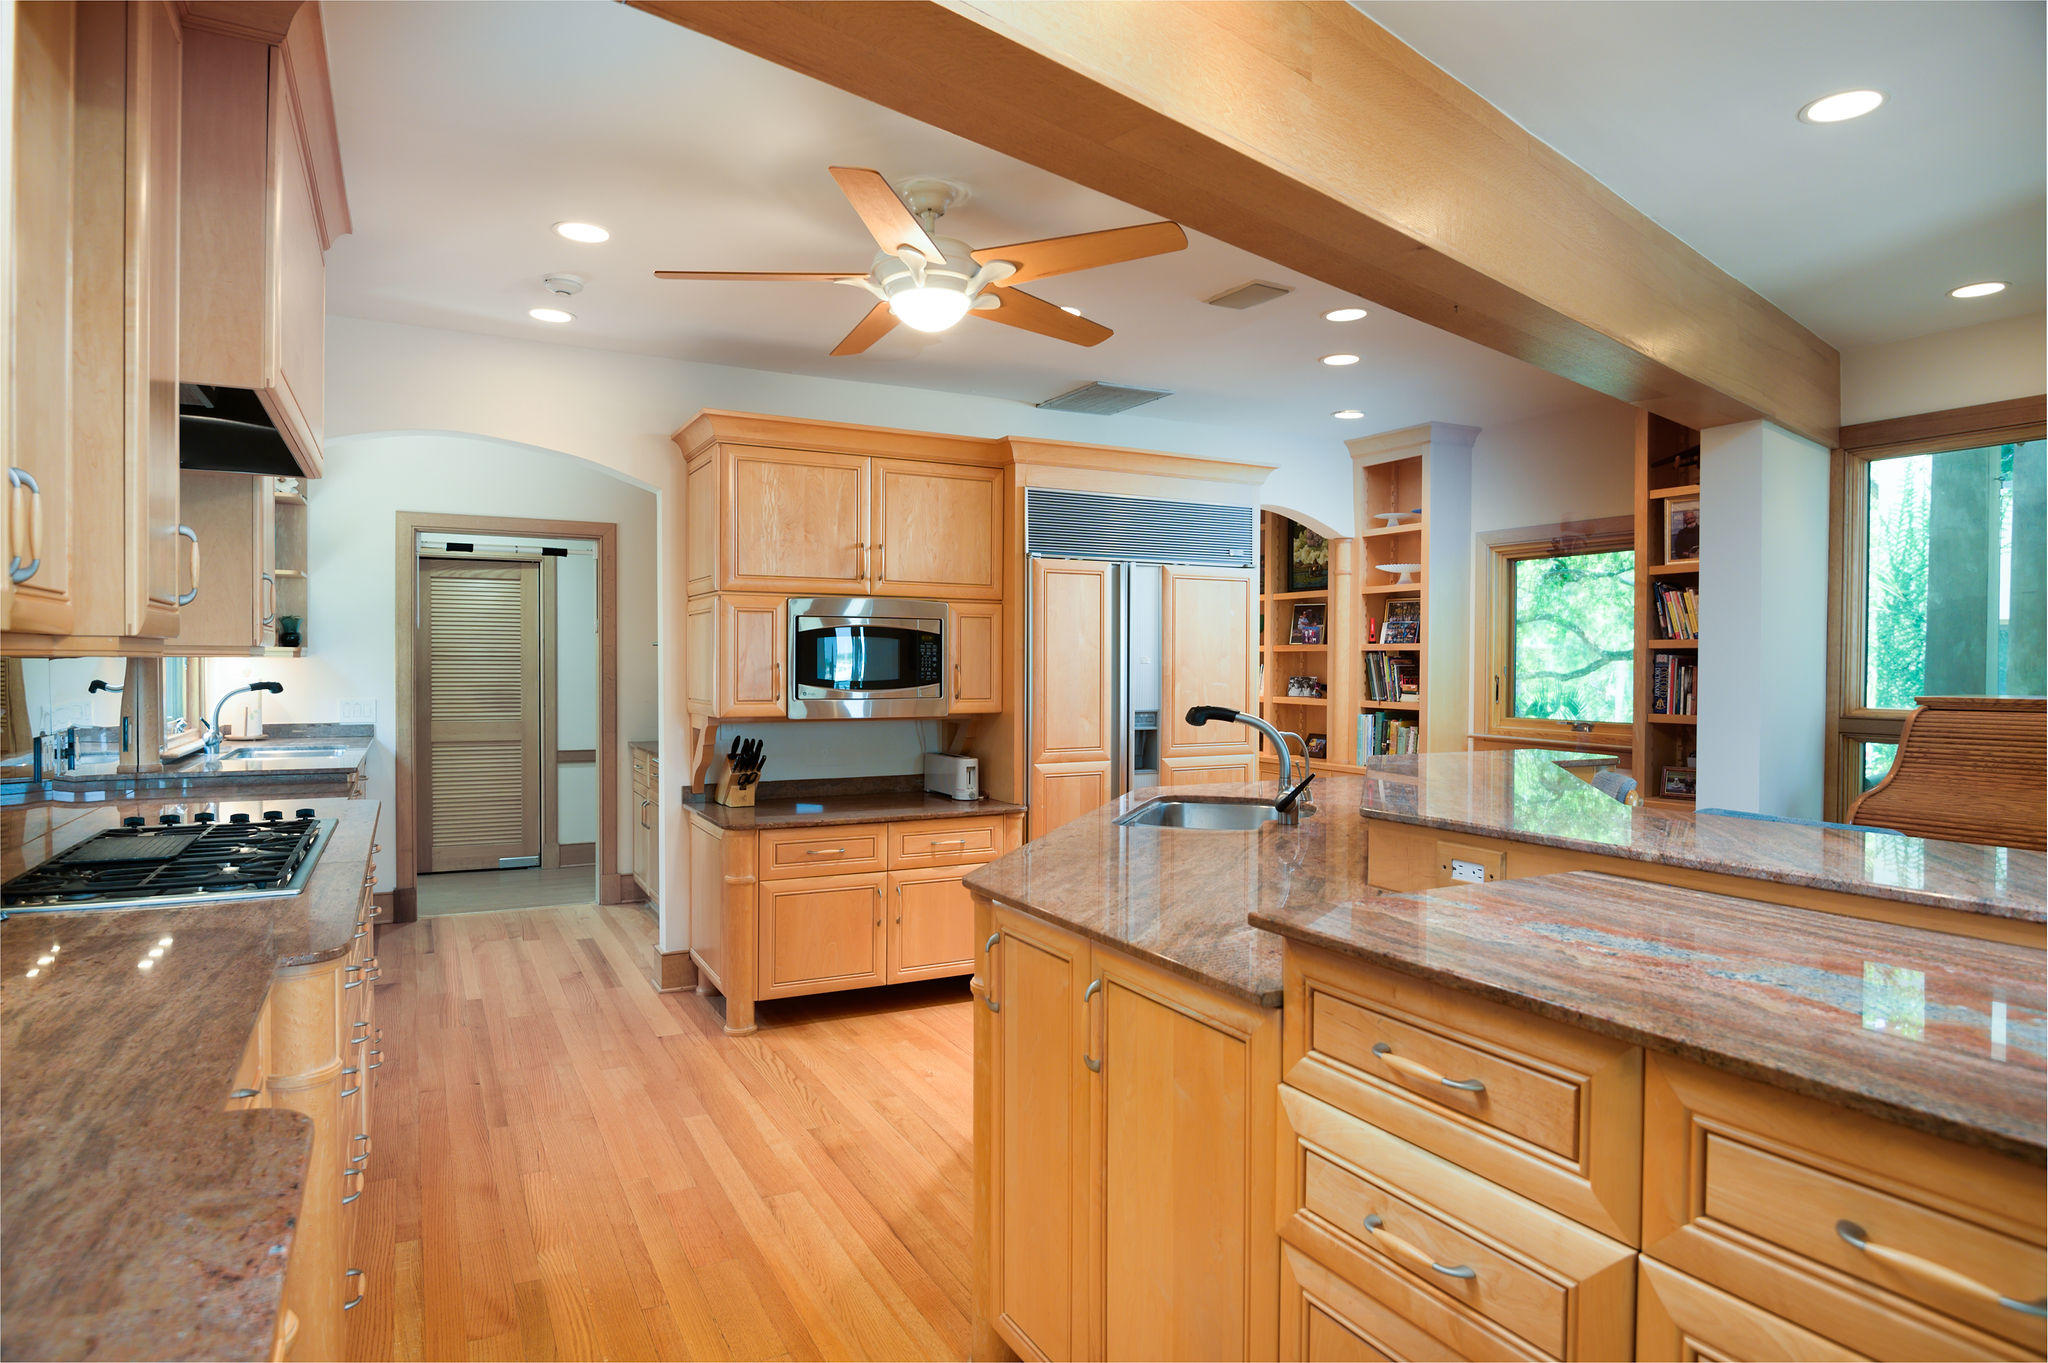 Seabrook Island Homes For Sale - 3087 Marshgate, Seabrook Island, SC - 19